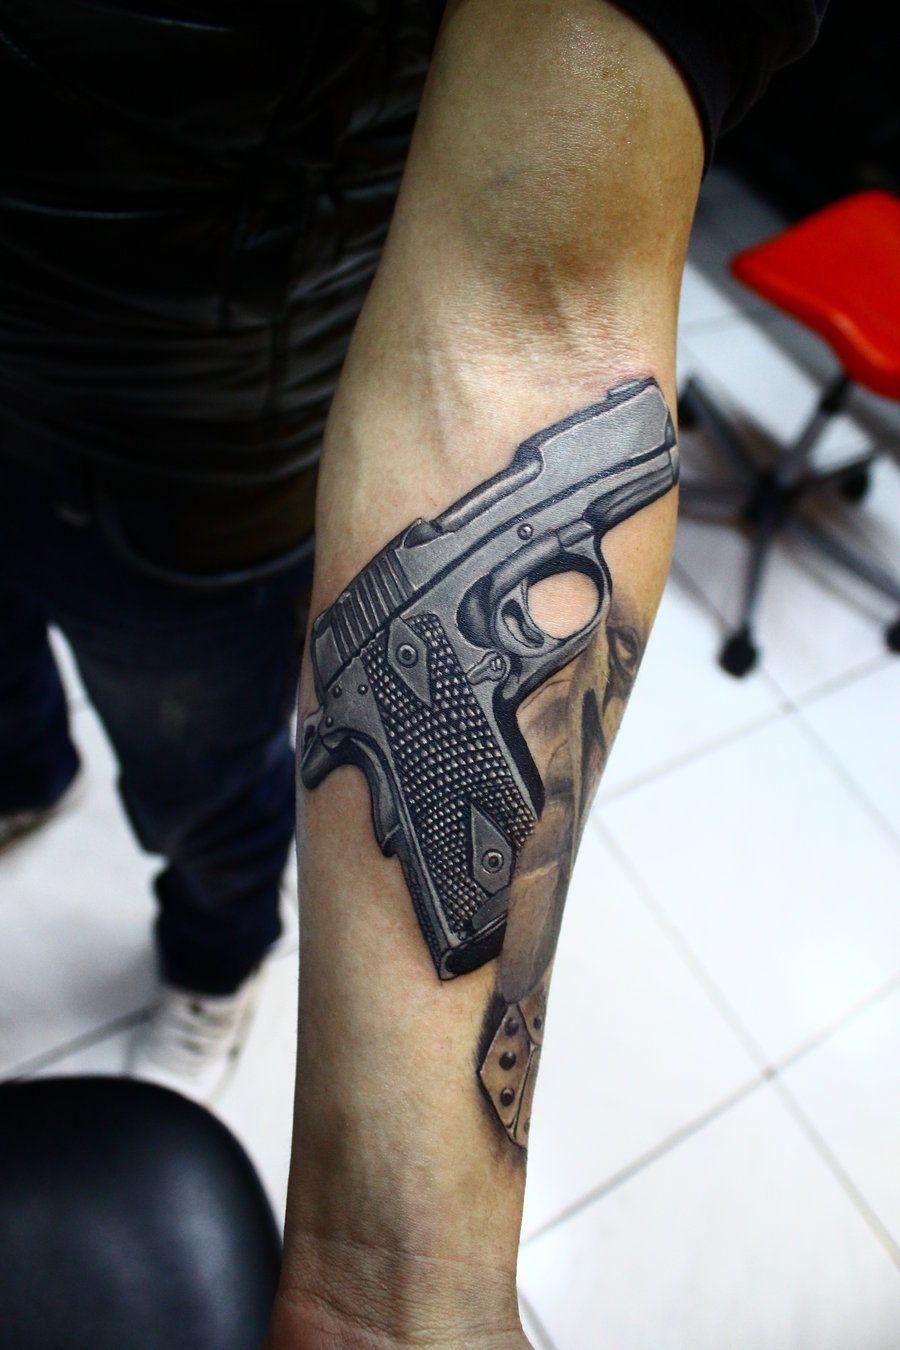 realistic gun tattoo ideas design on arm. Black Bedroom Furniture Sets. Home Design Ideas